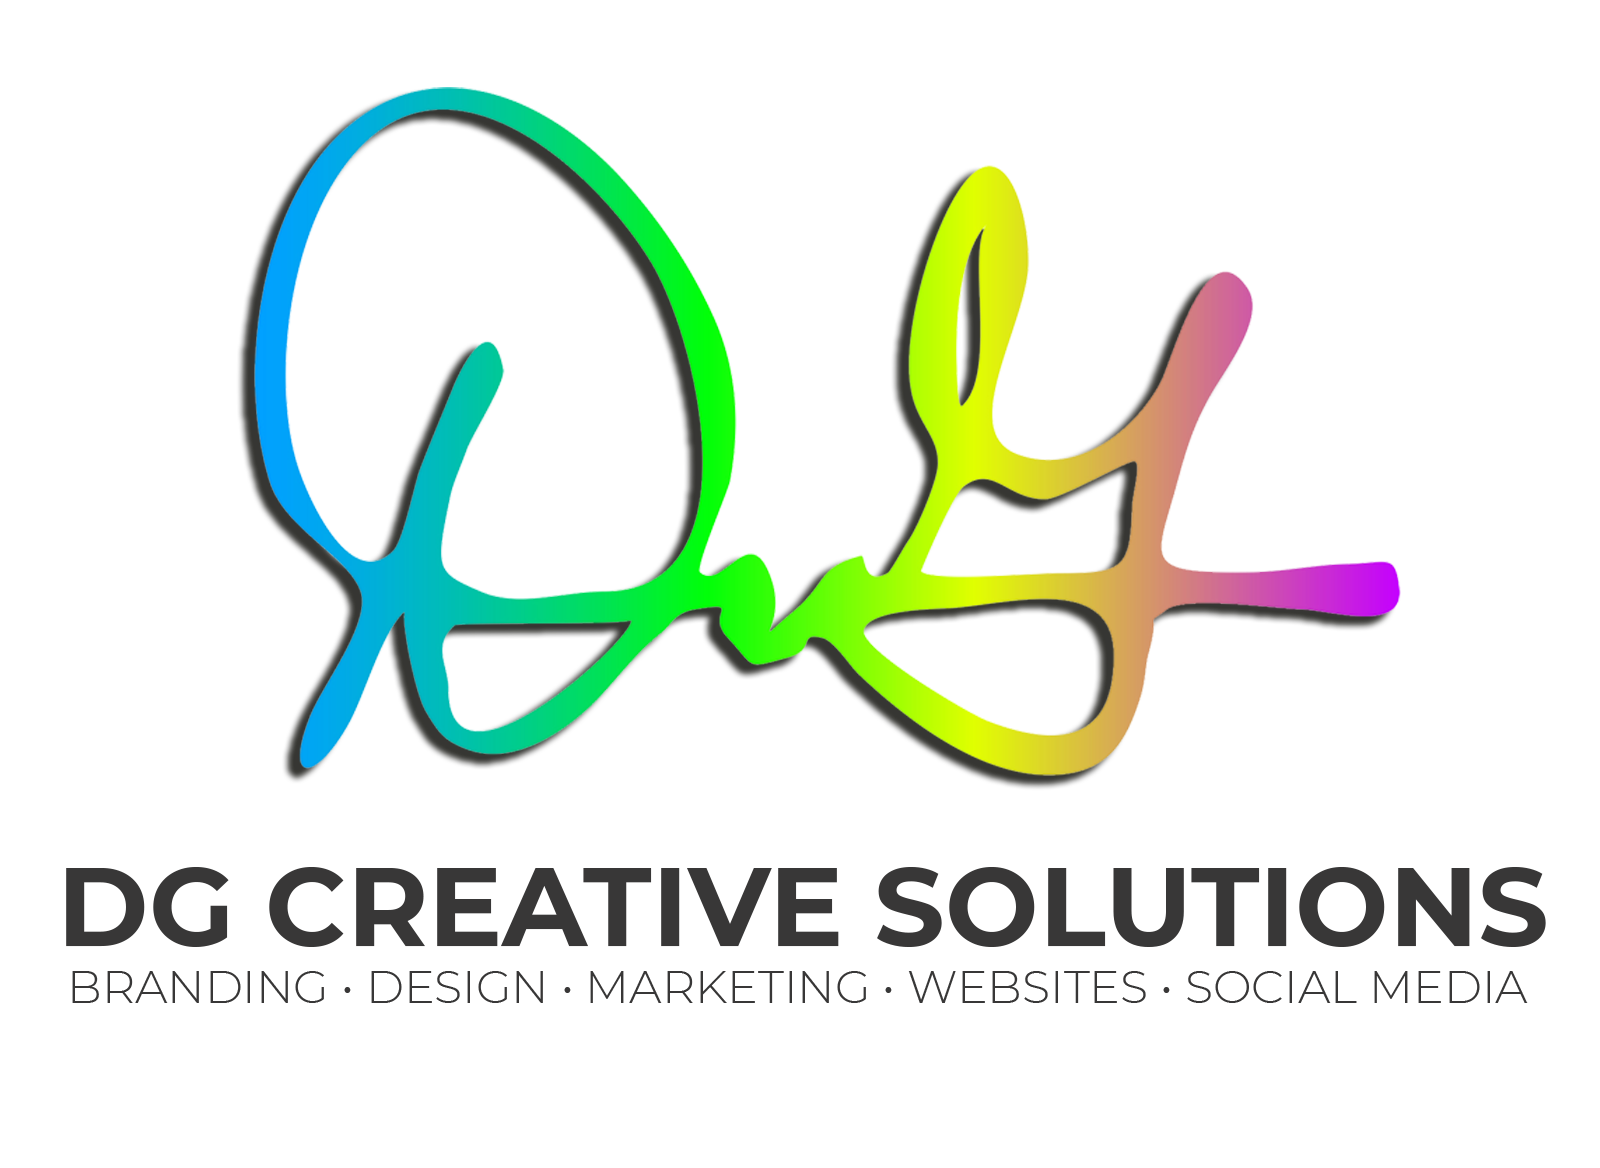 DG Creative Solutions